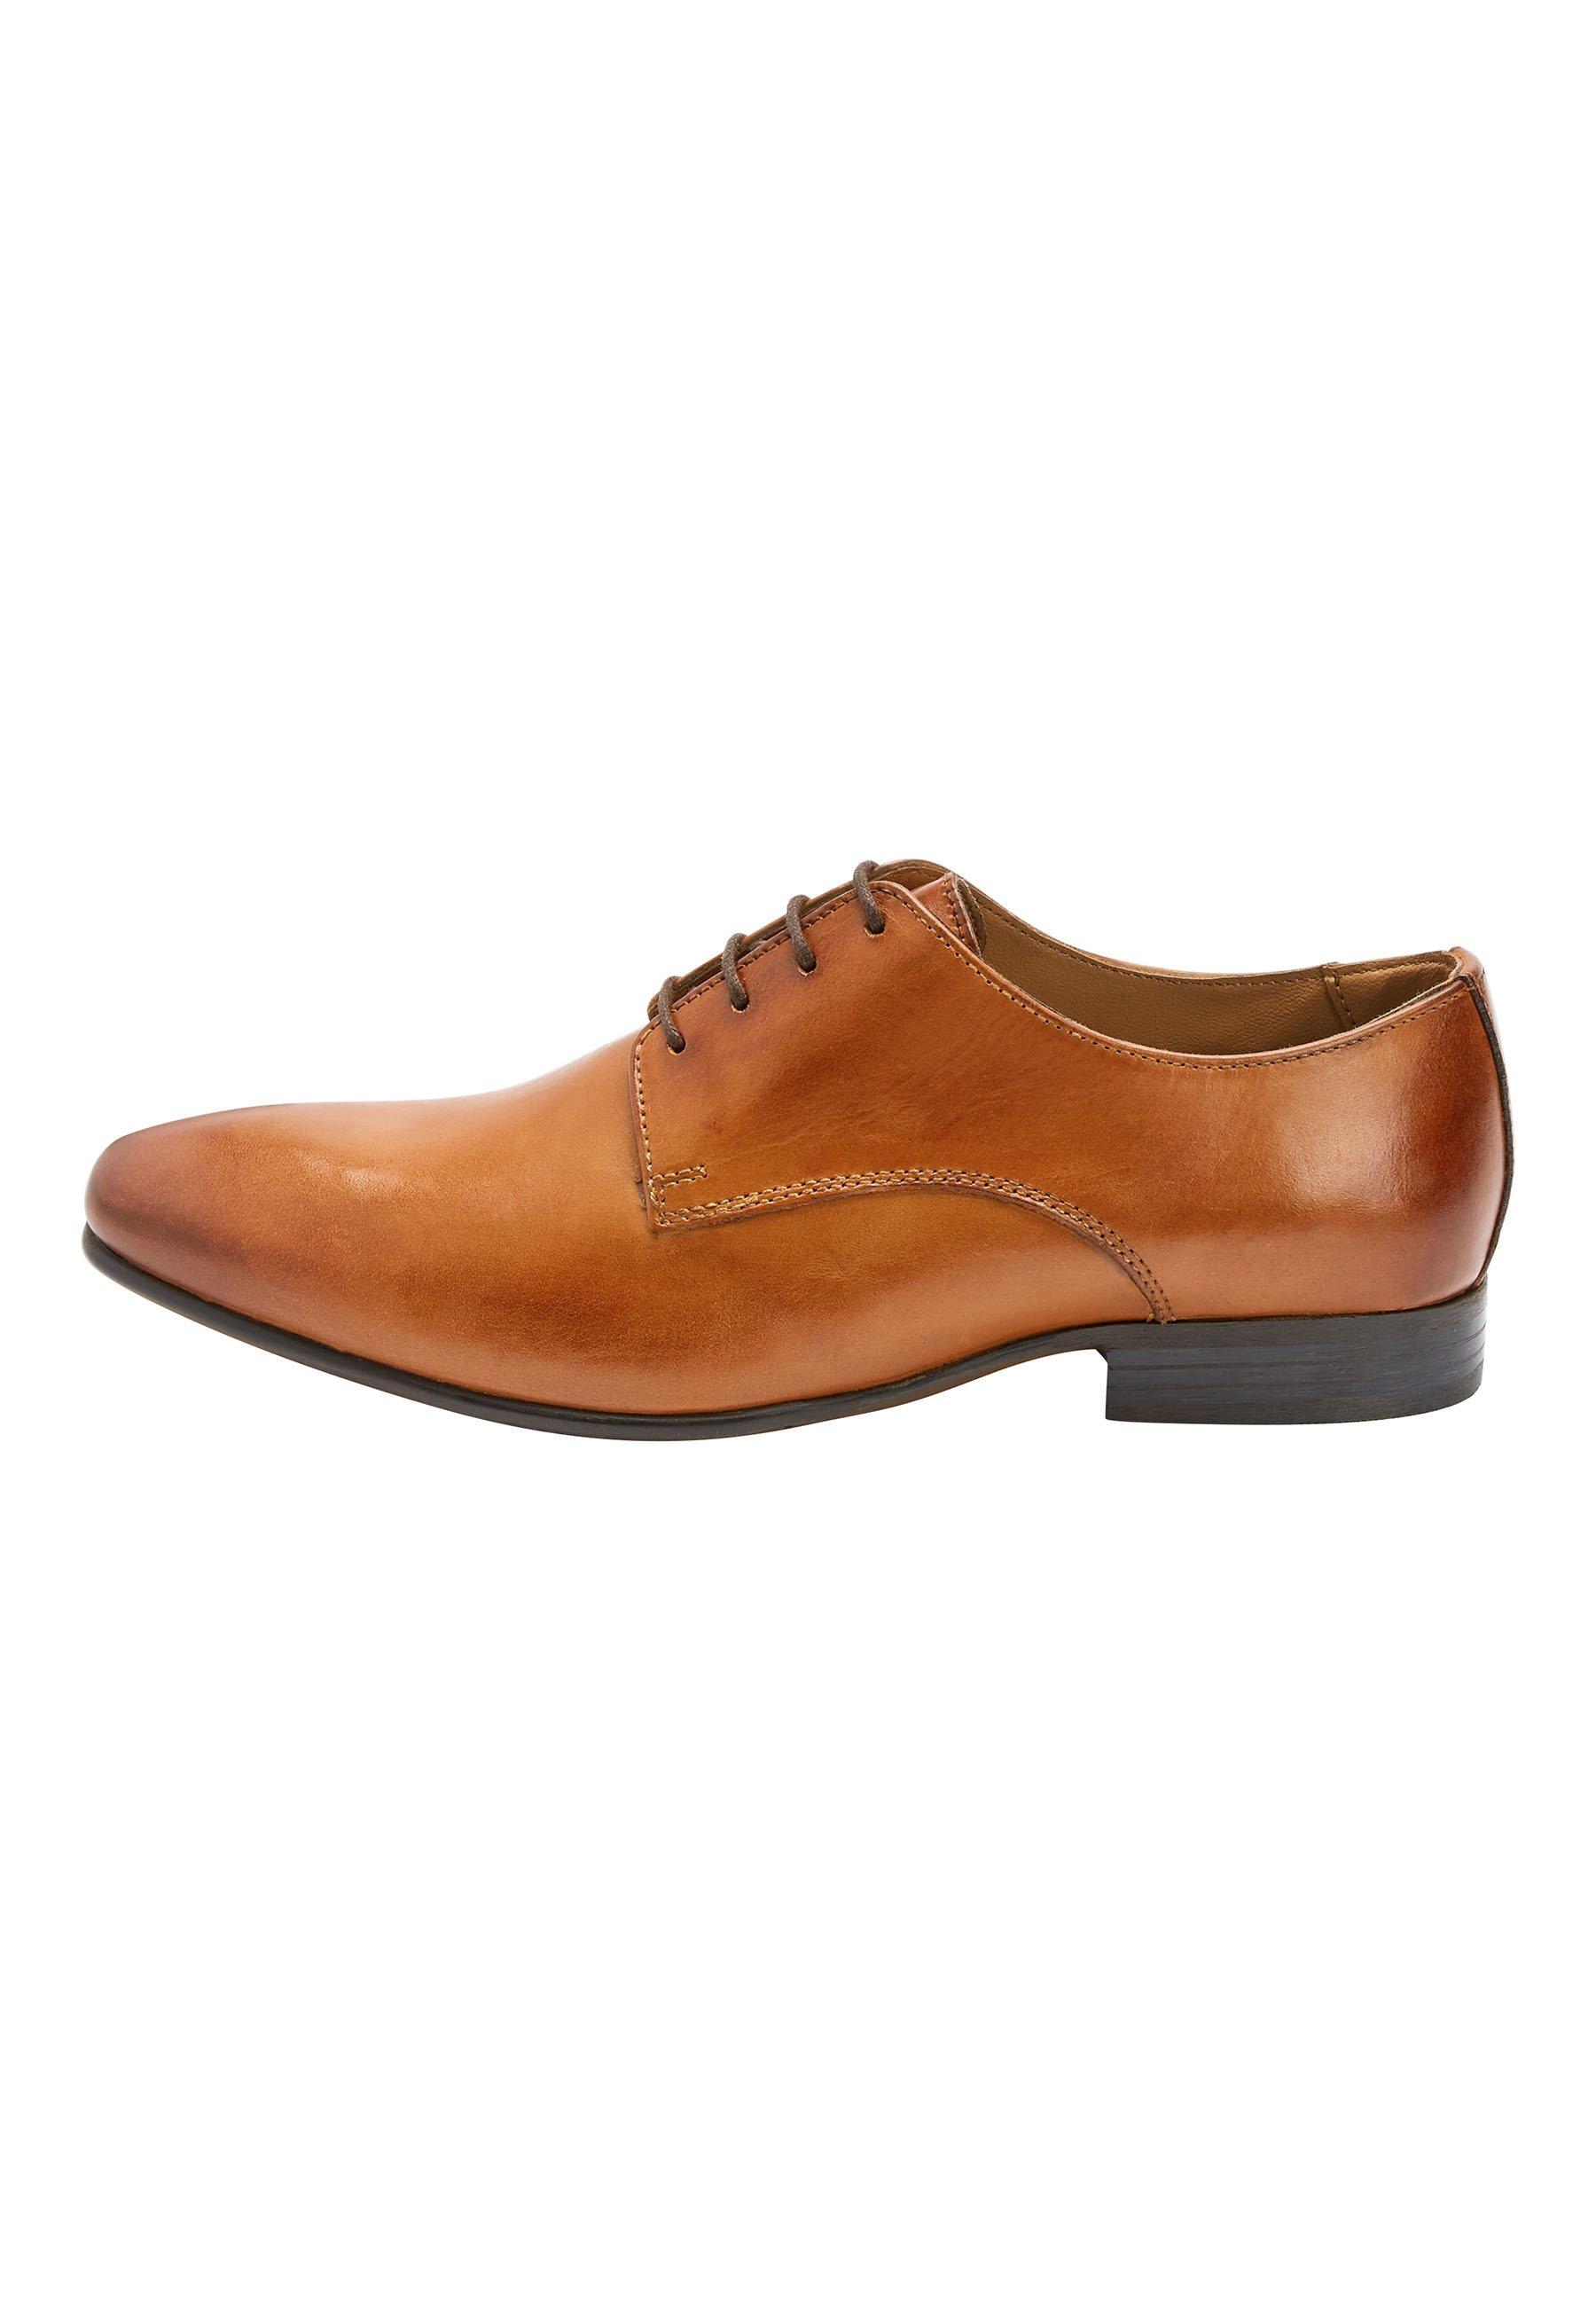 Herrer TAN DERBY SHOES - Business sko